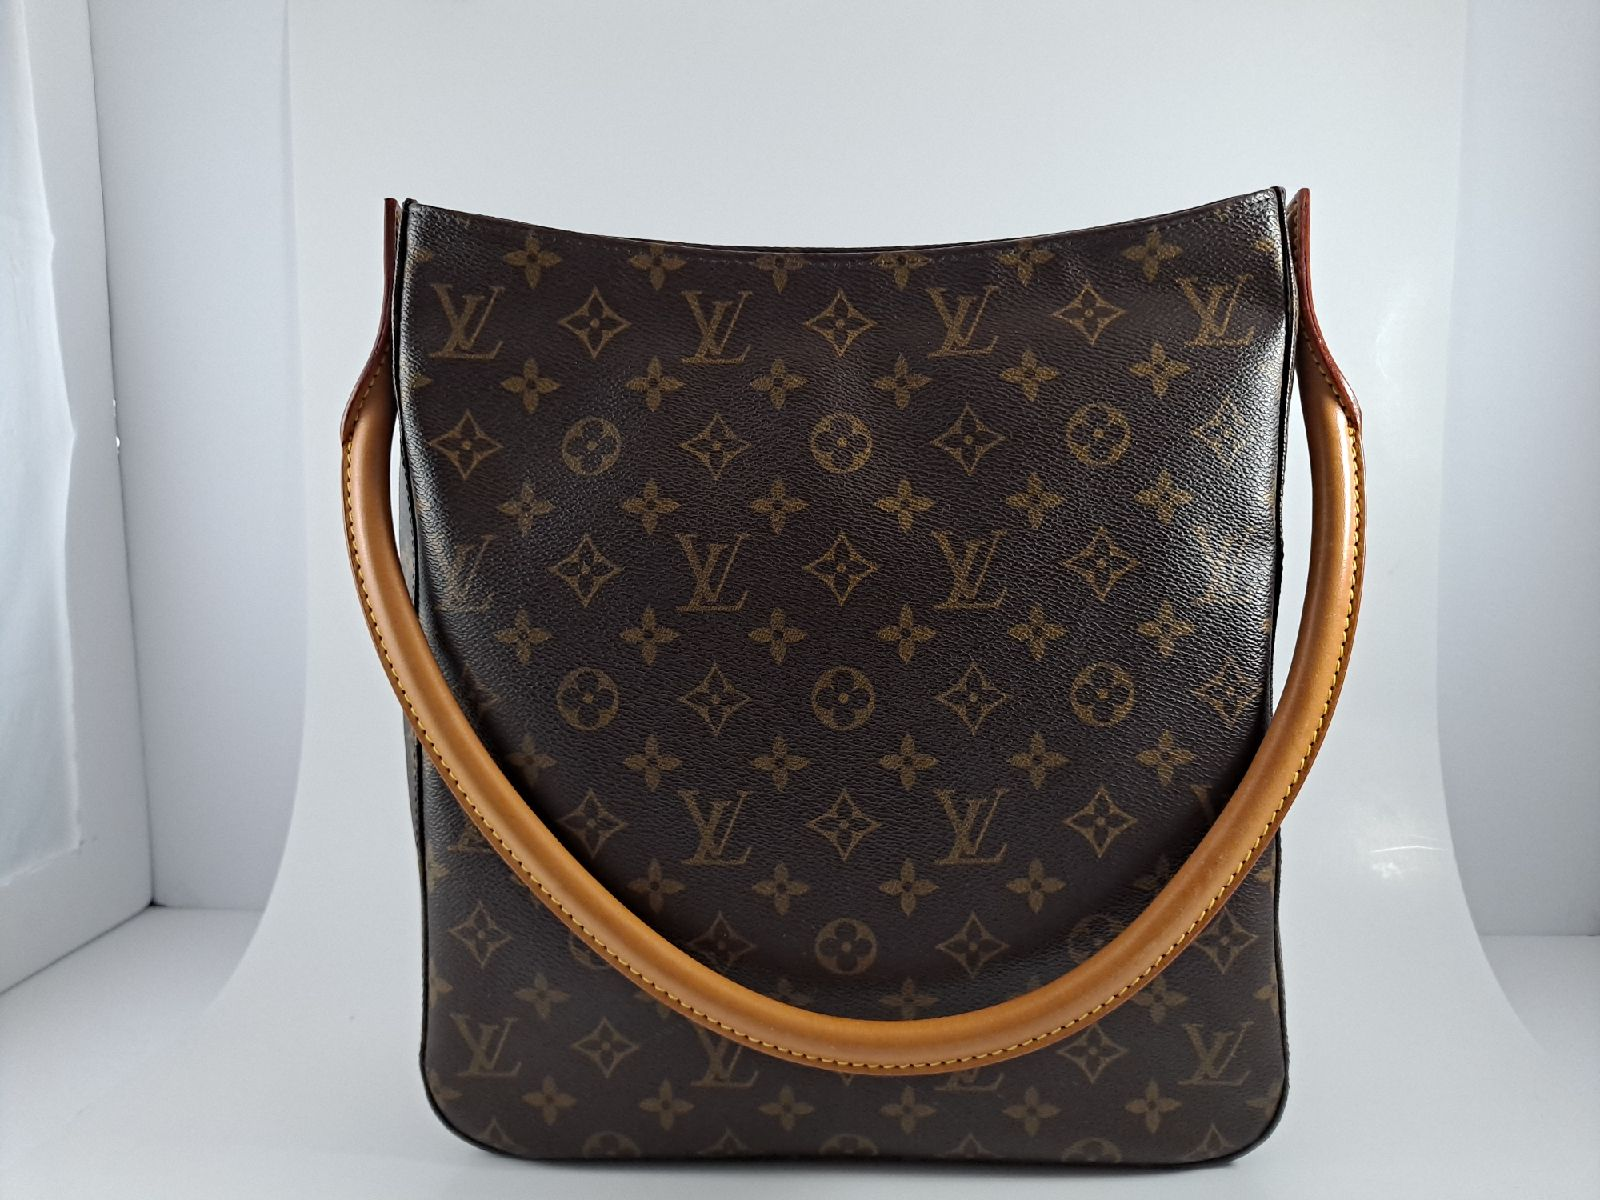 Louis Vuitton Looping Gm Shoulder